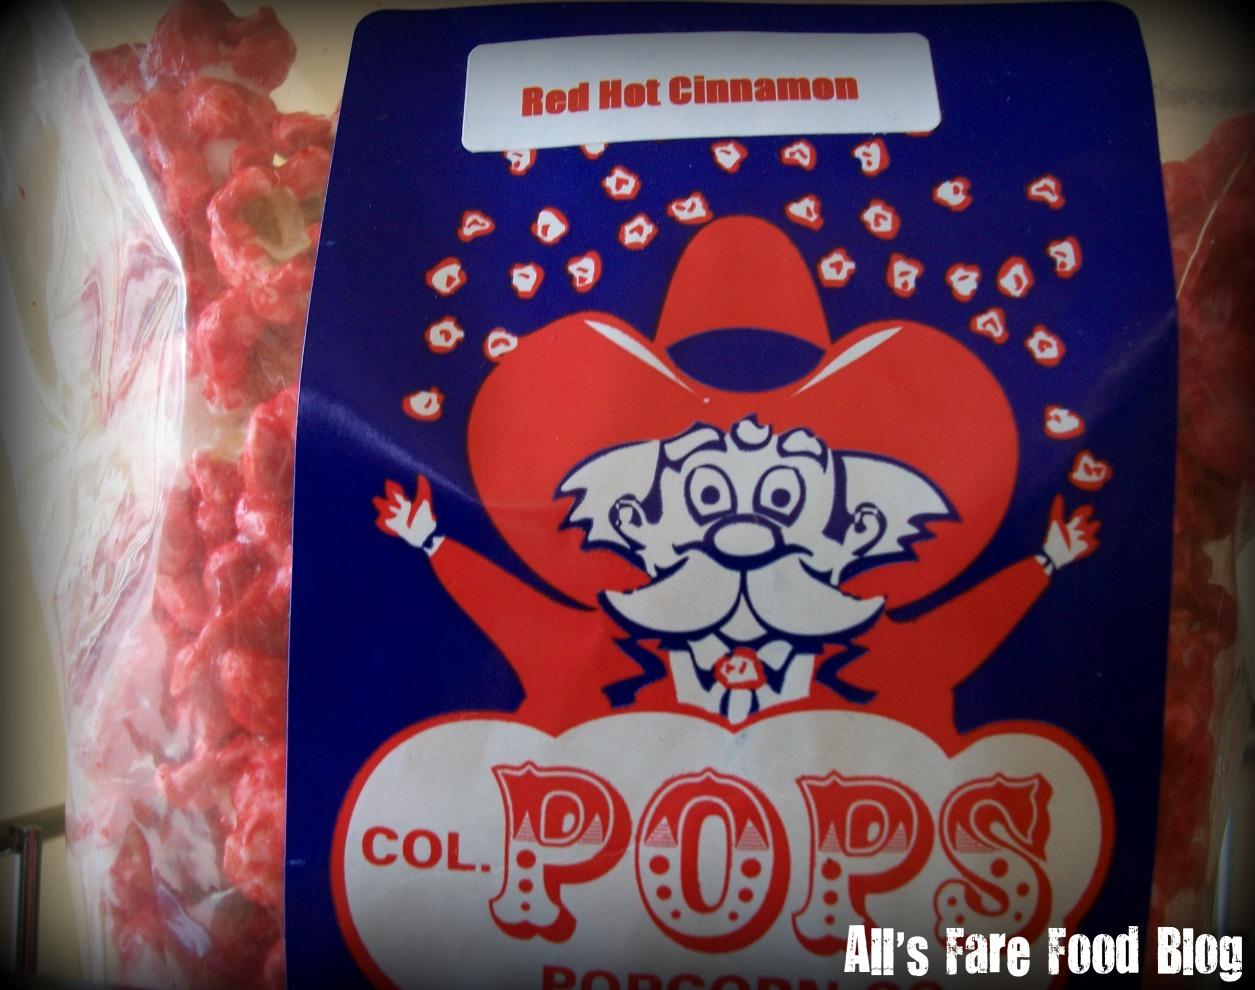 Col. Pops Popcorn Comp...